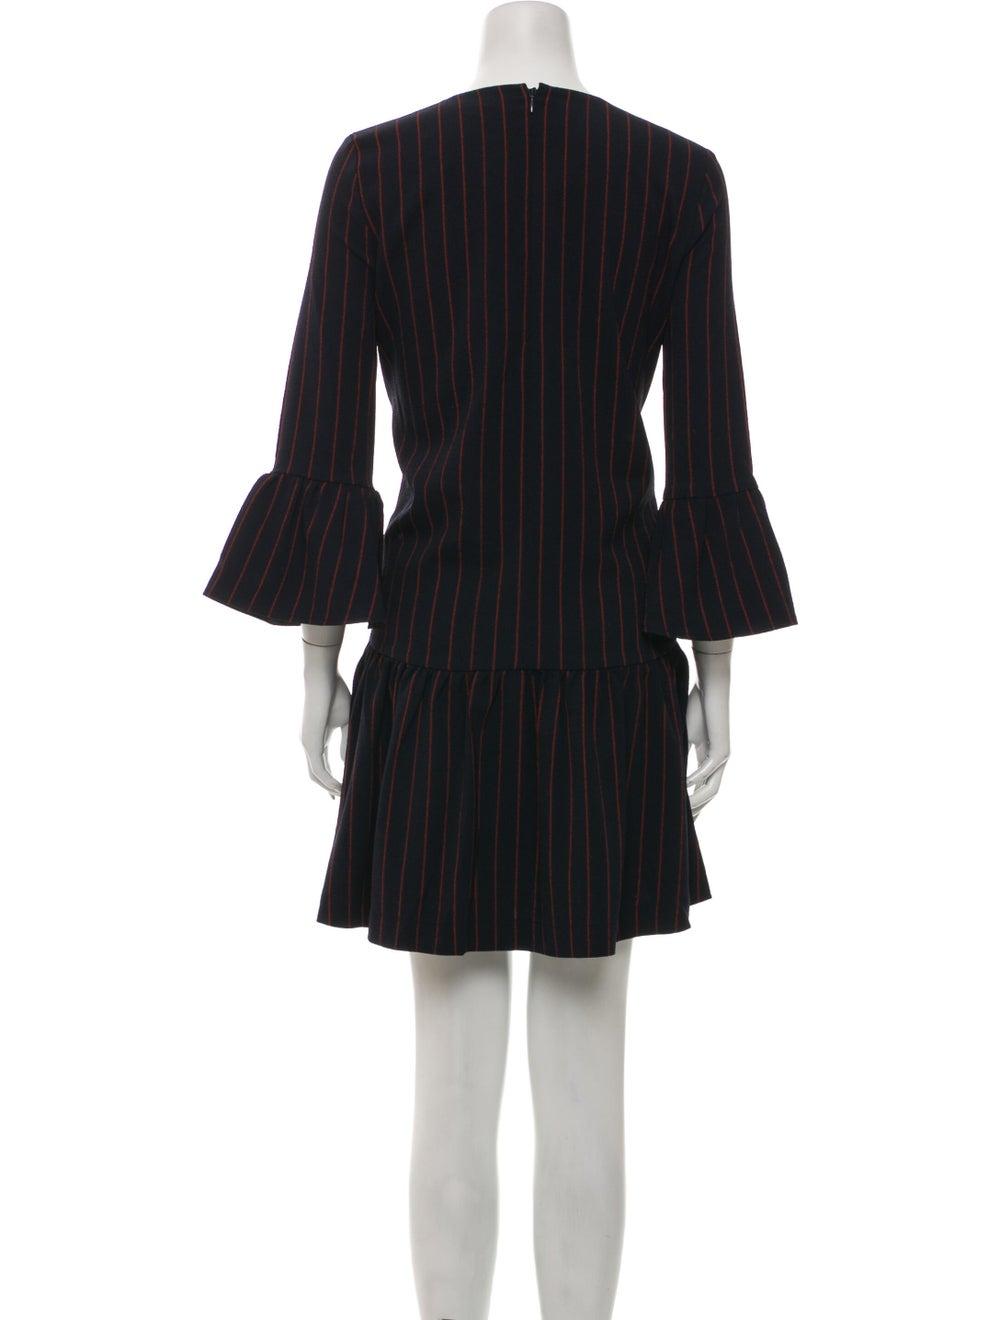 Ganni Crew Neck Mini Dress - image 3